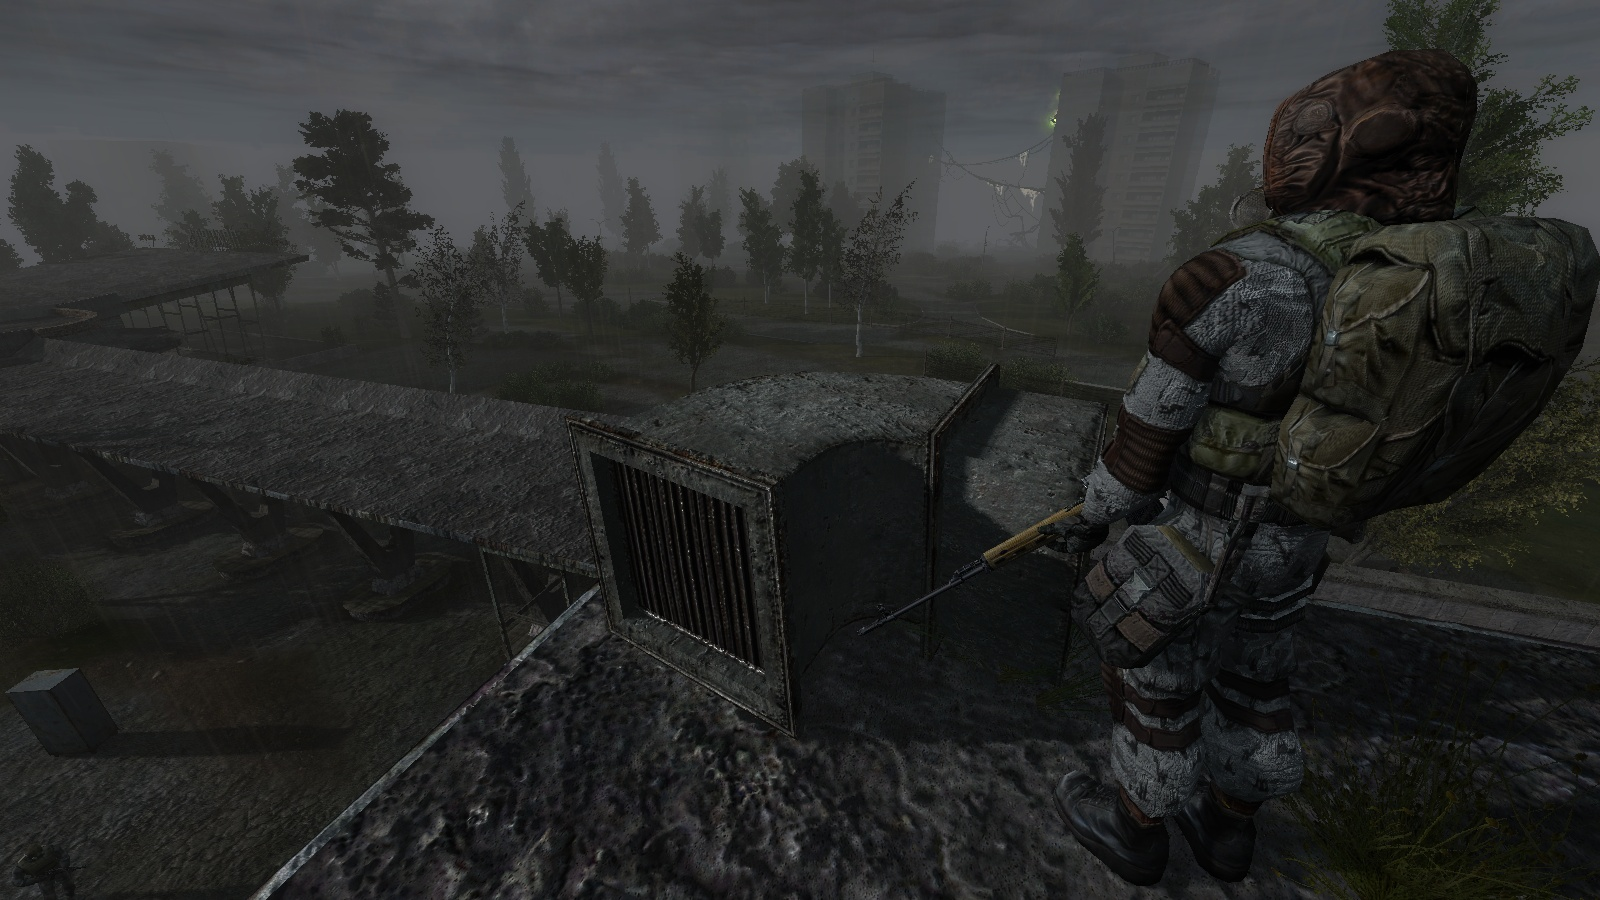 Fichier:Monolith sniper.jpg